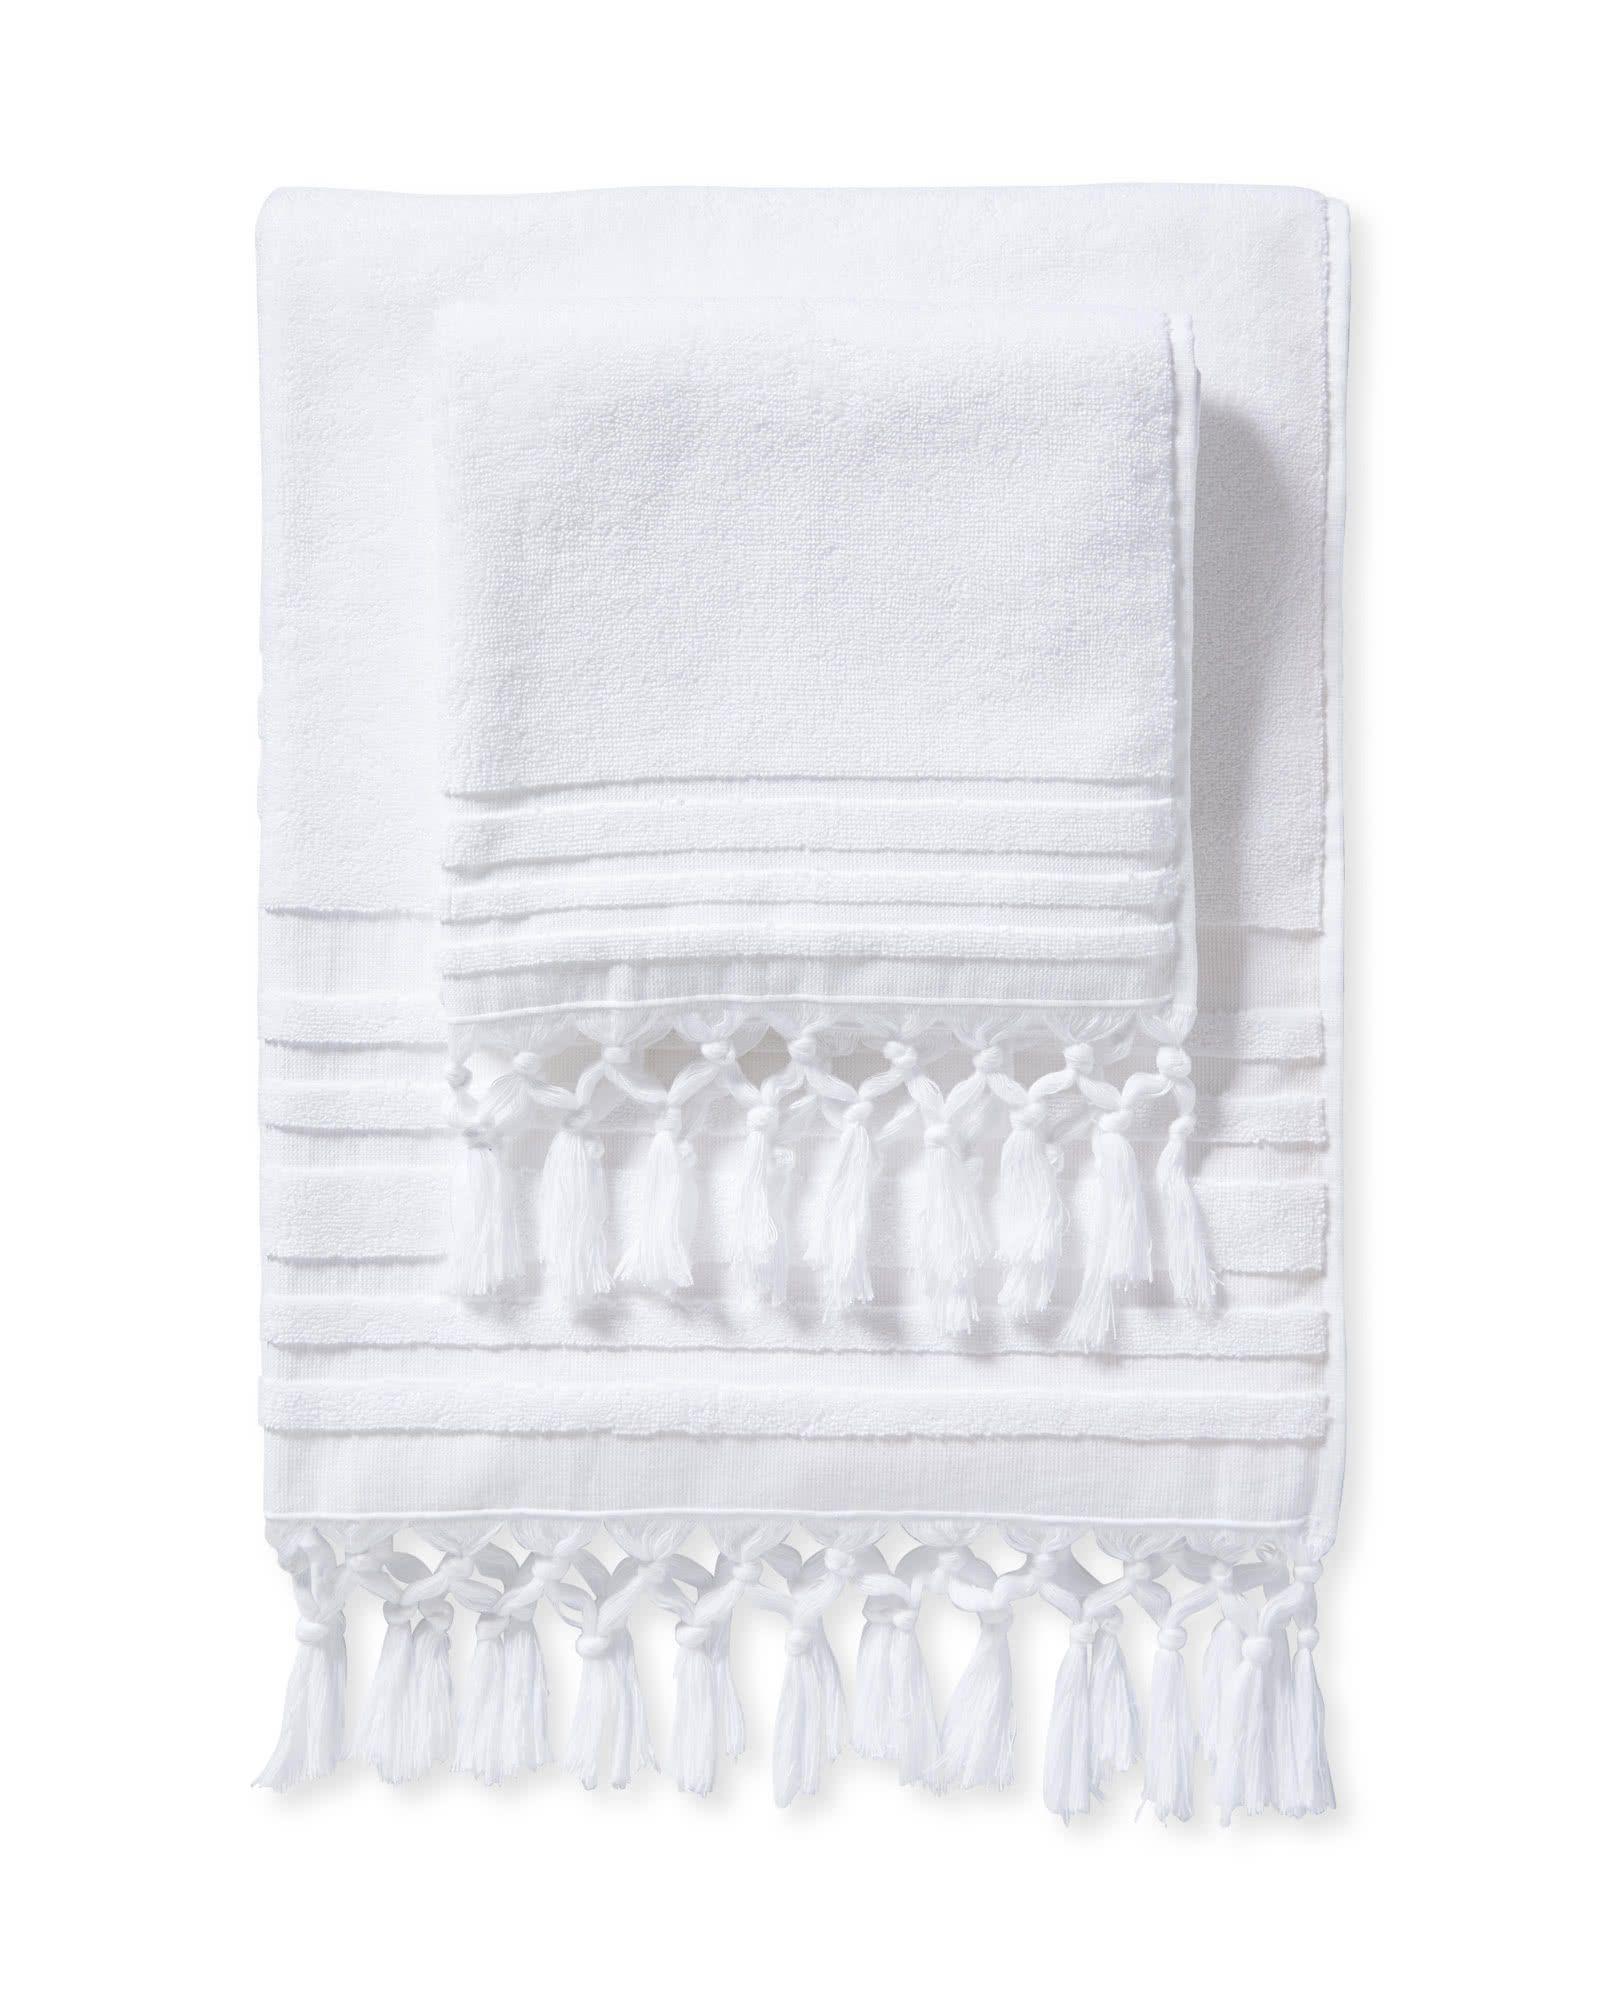 Healdsburg Bath Collection Nautical Bathrooms Luxury Towels